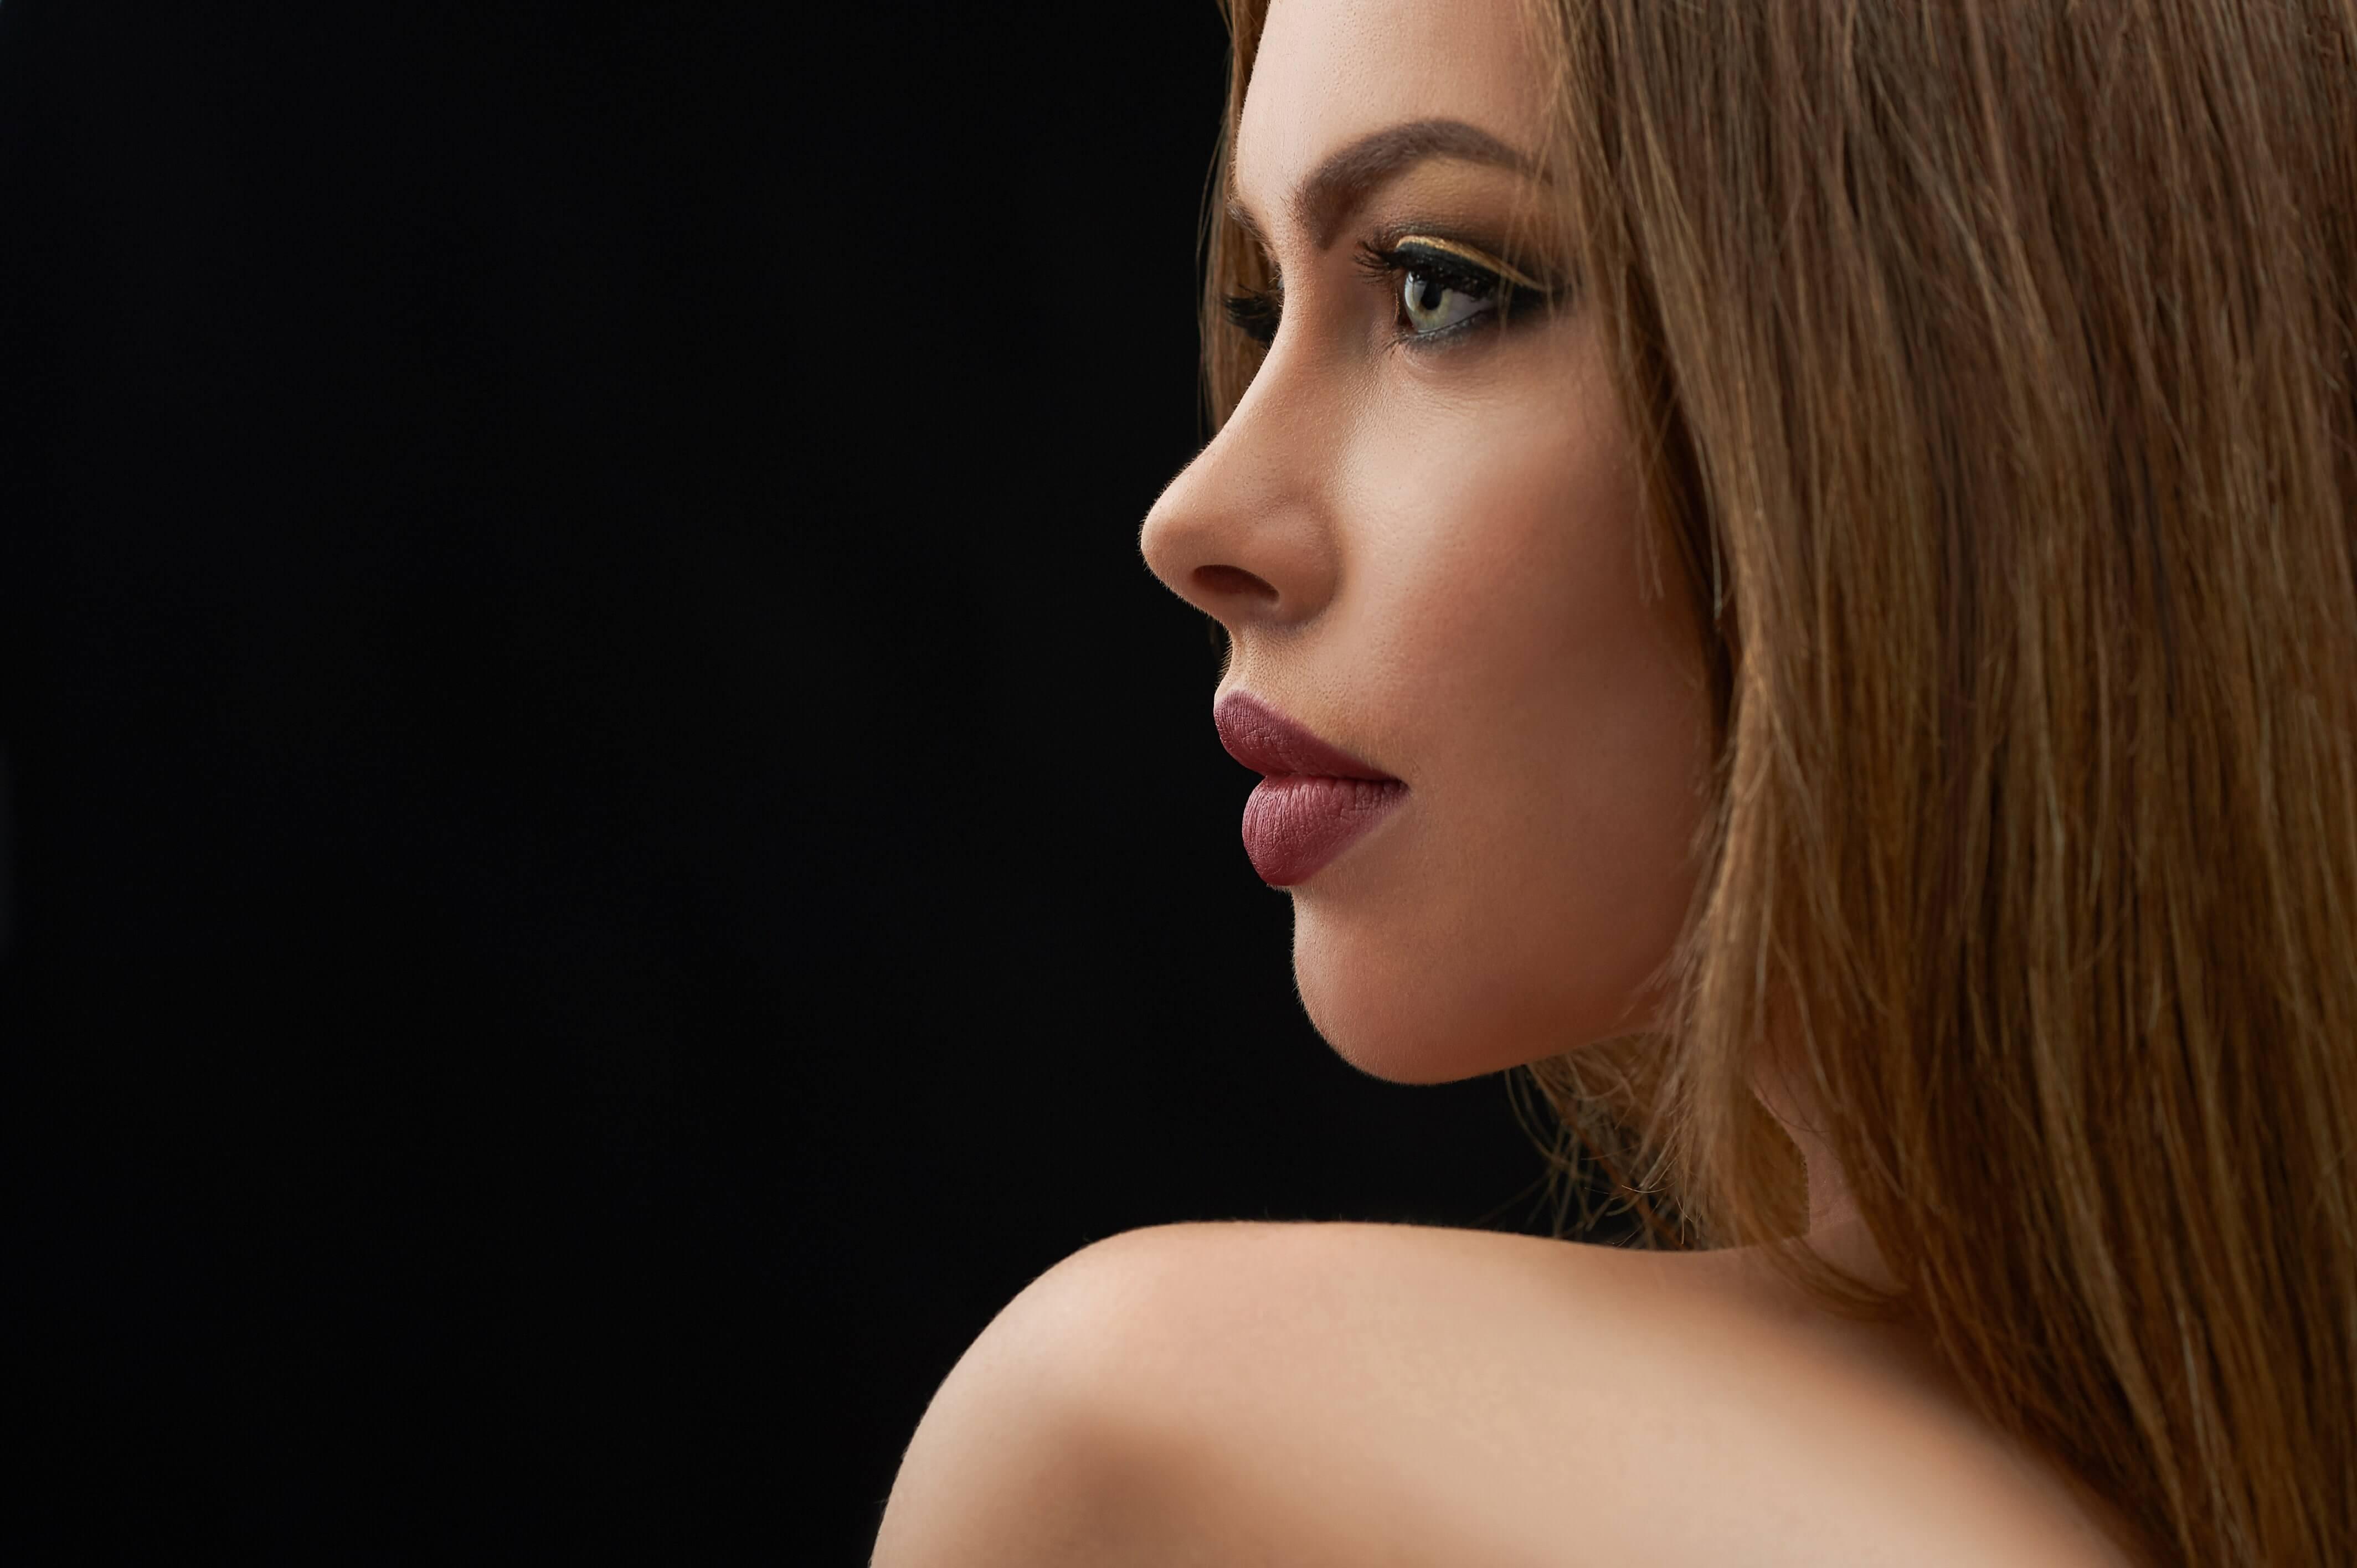 Lip Enhancement Women from Misssissauga